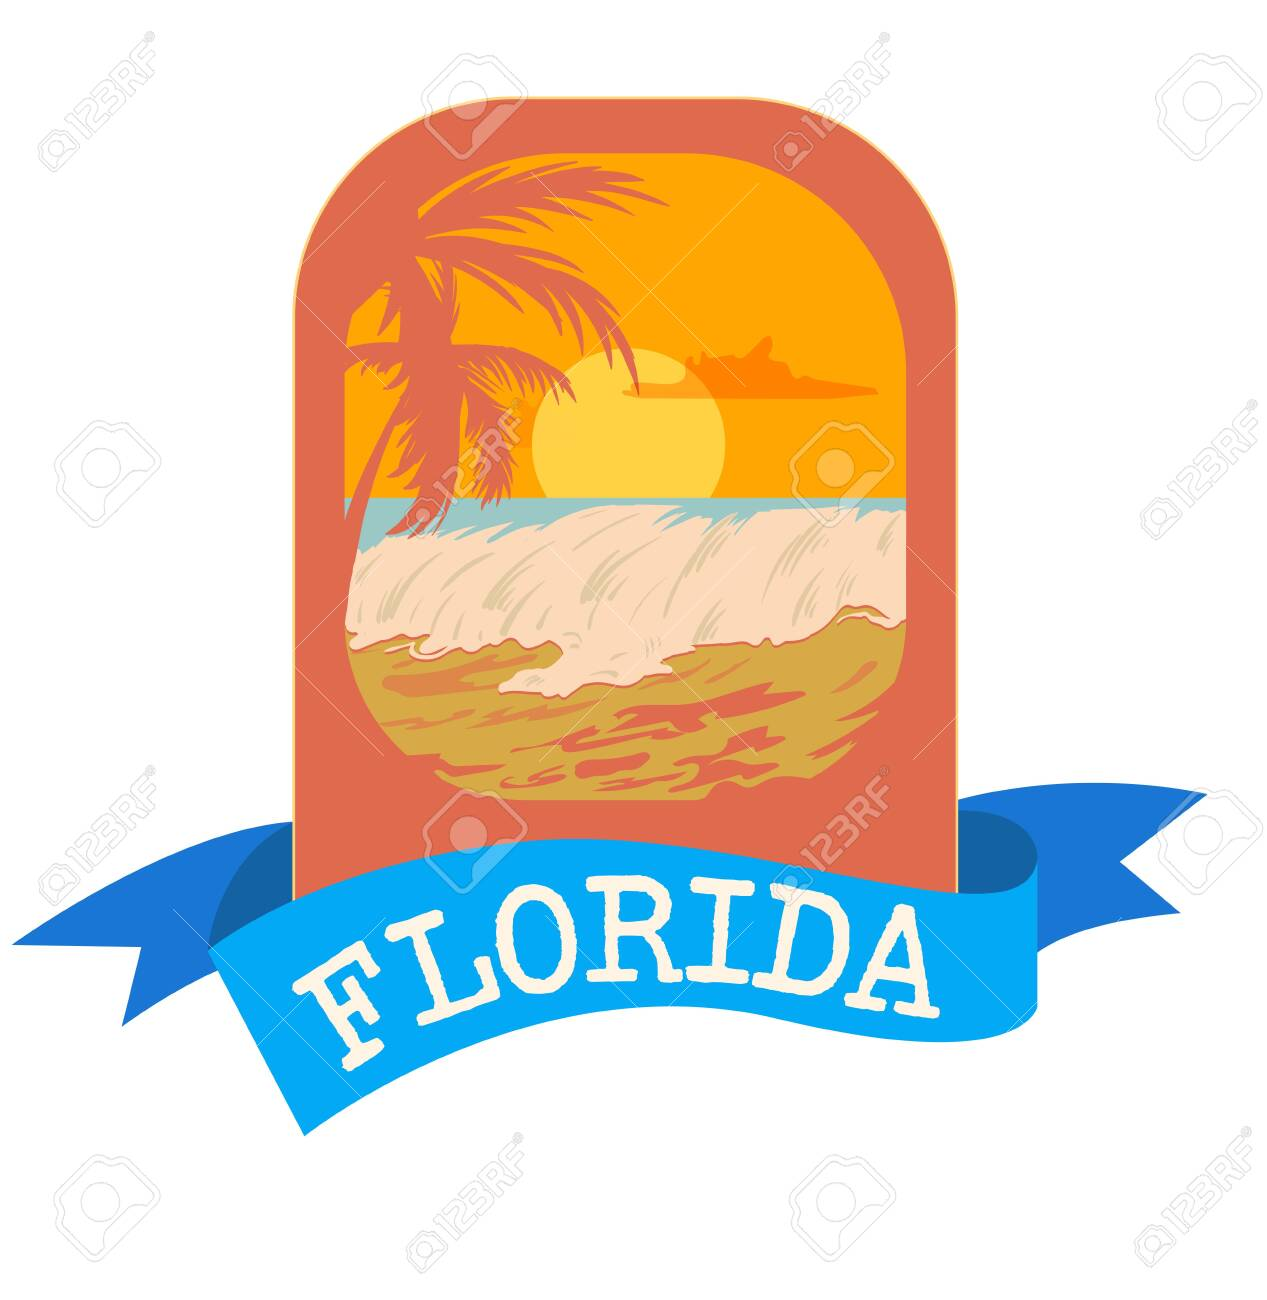 Surf Florida typography , tee shirt graphic emblem, vector illustration. - 128367693